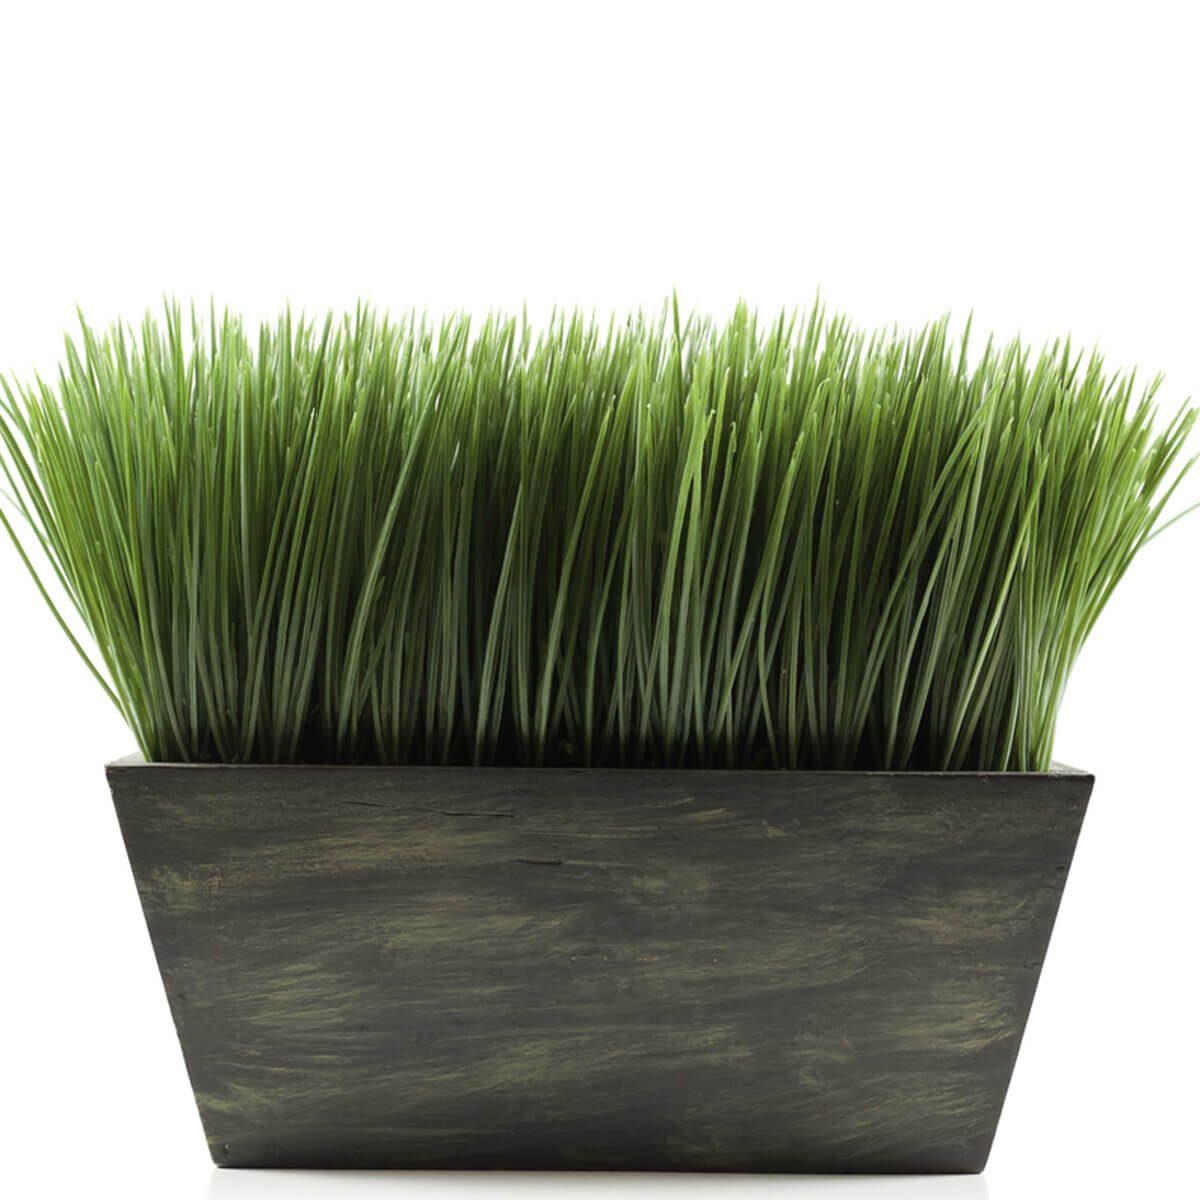 grass planter box _98646533_10